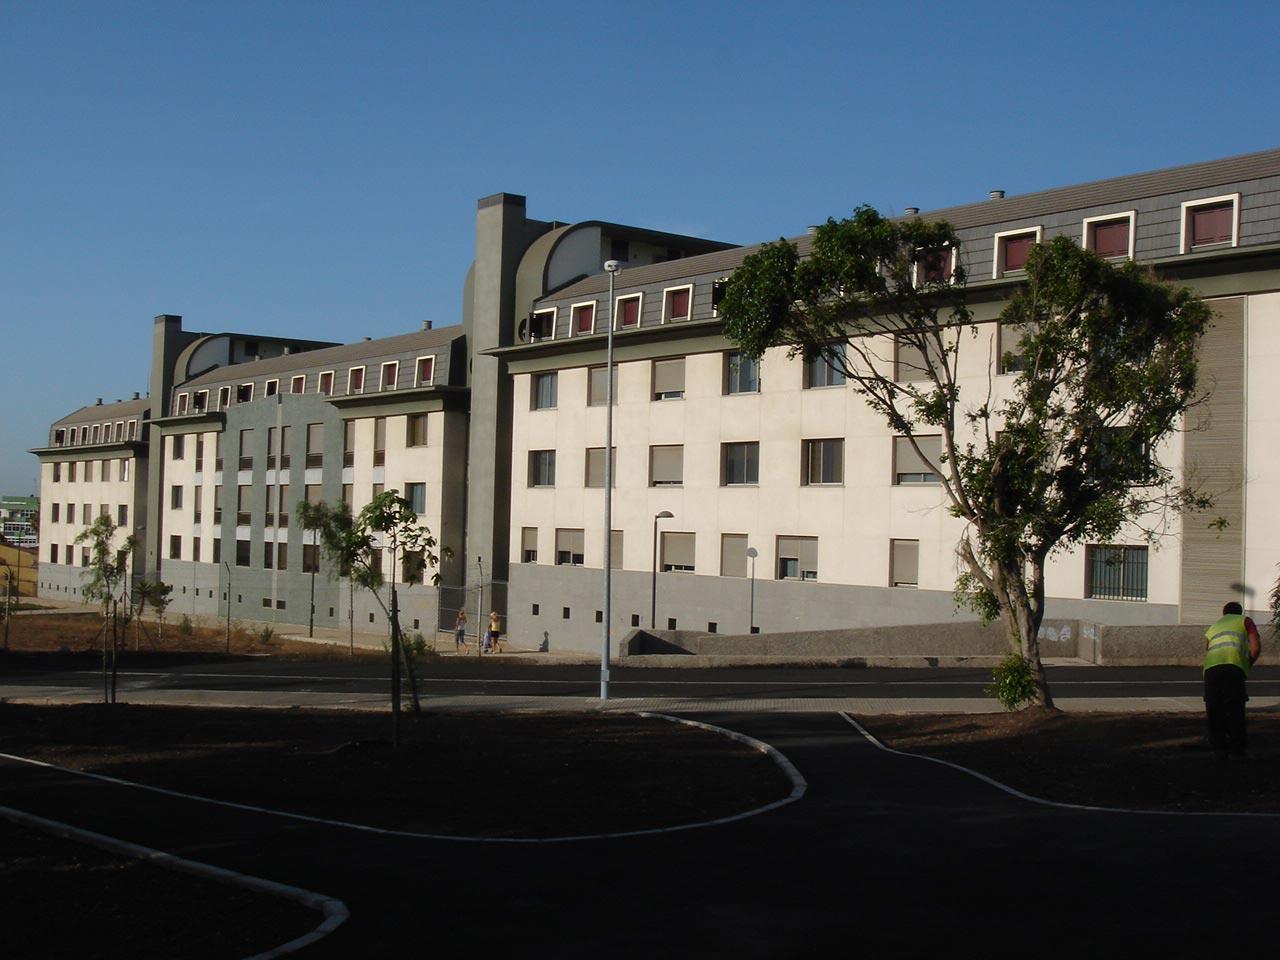 JAMPER-Residencial-Obras-Reformas-Tenerife-Edificios-Tinguaro-001.jpg